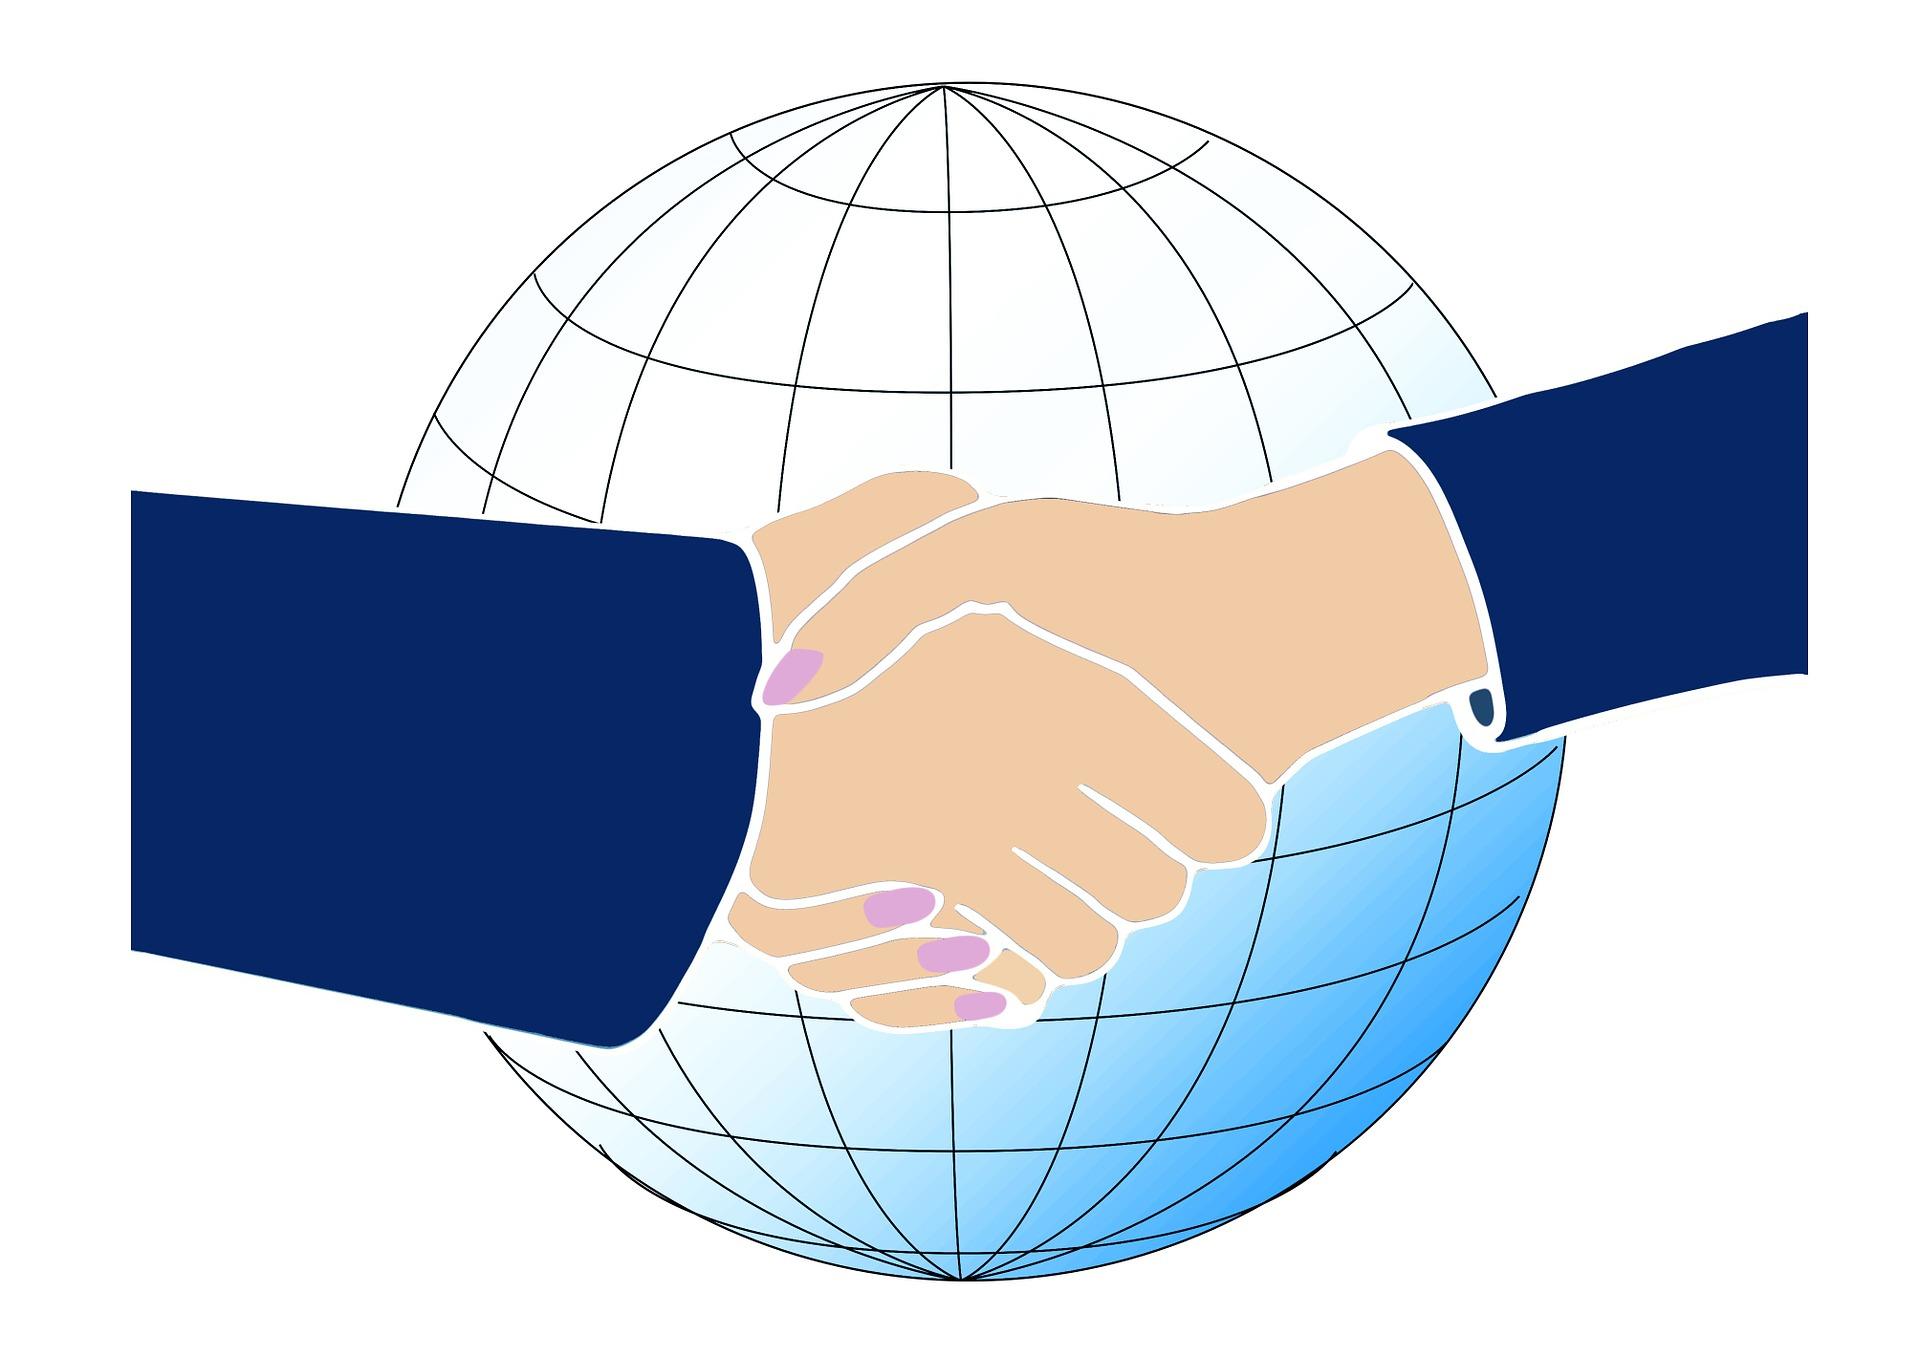 Verhandlung Agieren Re-agieren Verhandlungsirrtümer Irrtum Machtspiele Deeskalation Phasen Verhandlungsseminar Partner